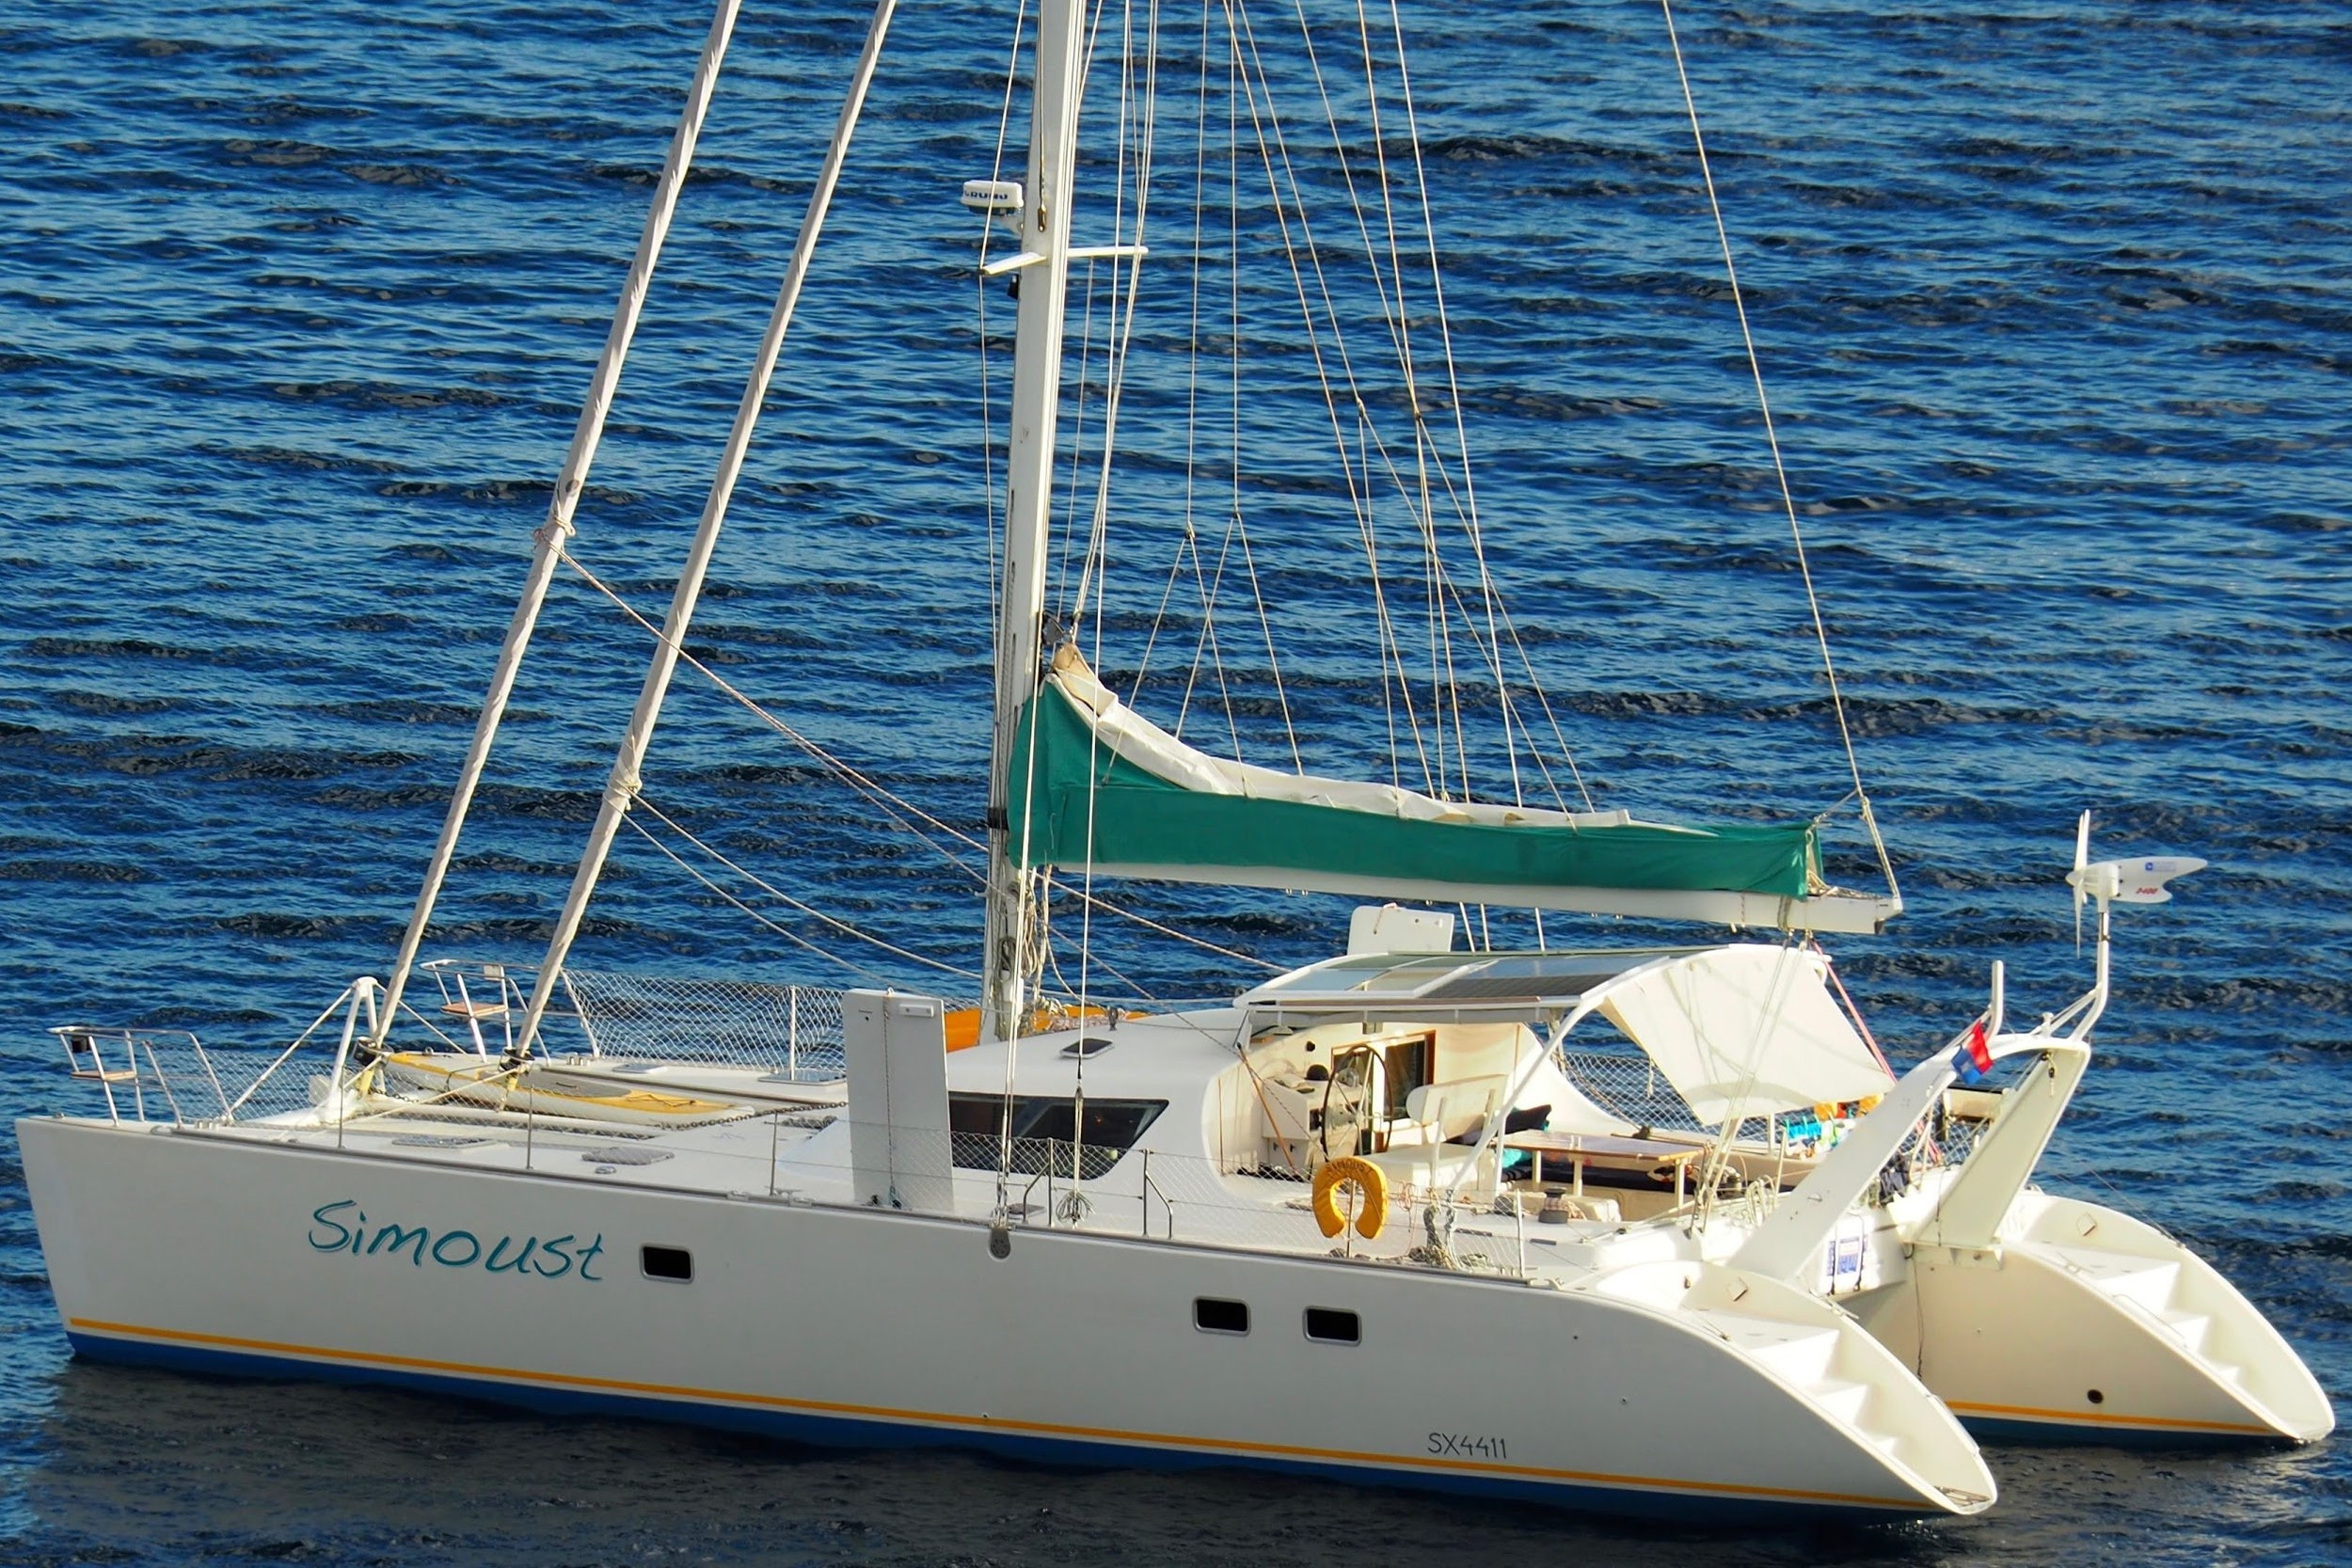 simoust_switch51_catamaran_exterior